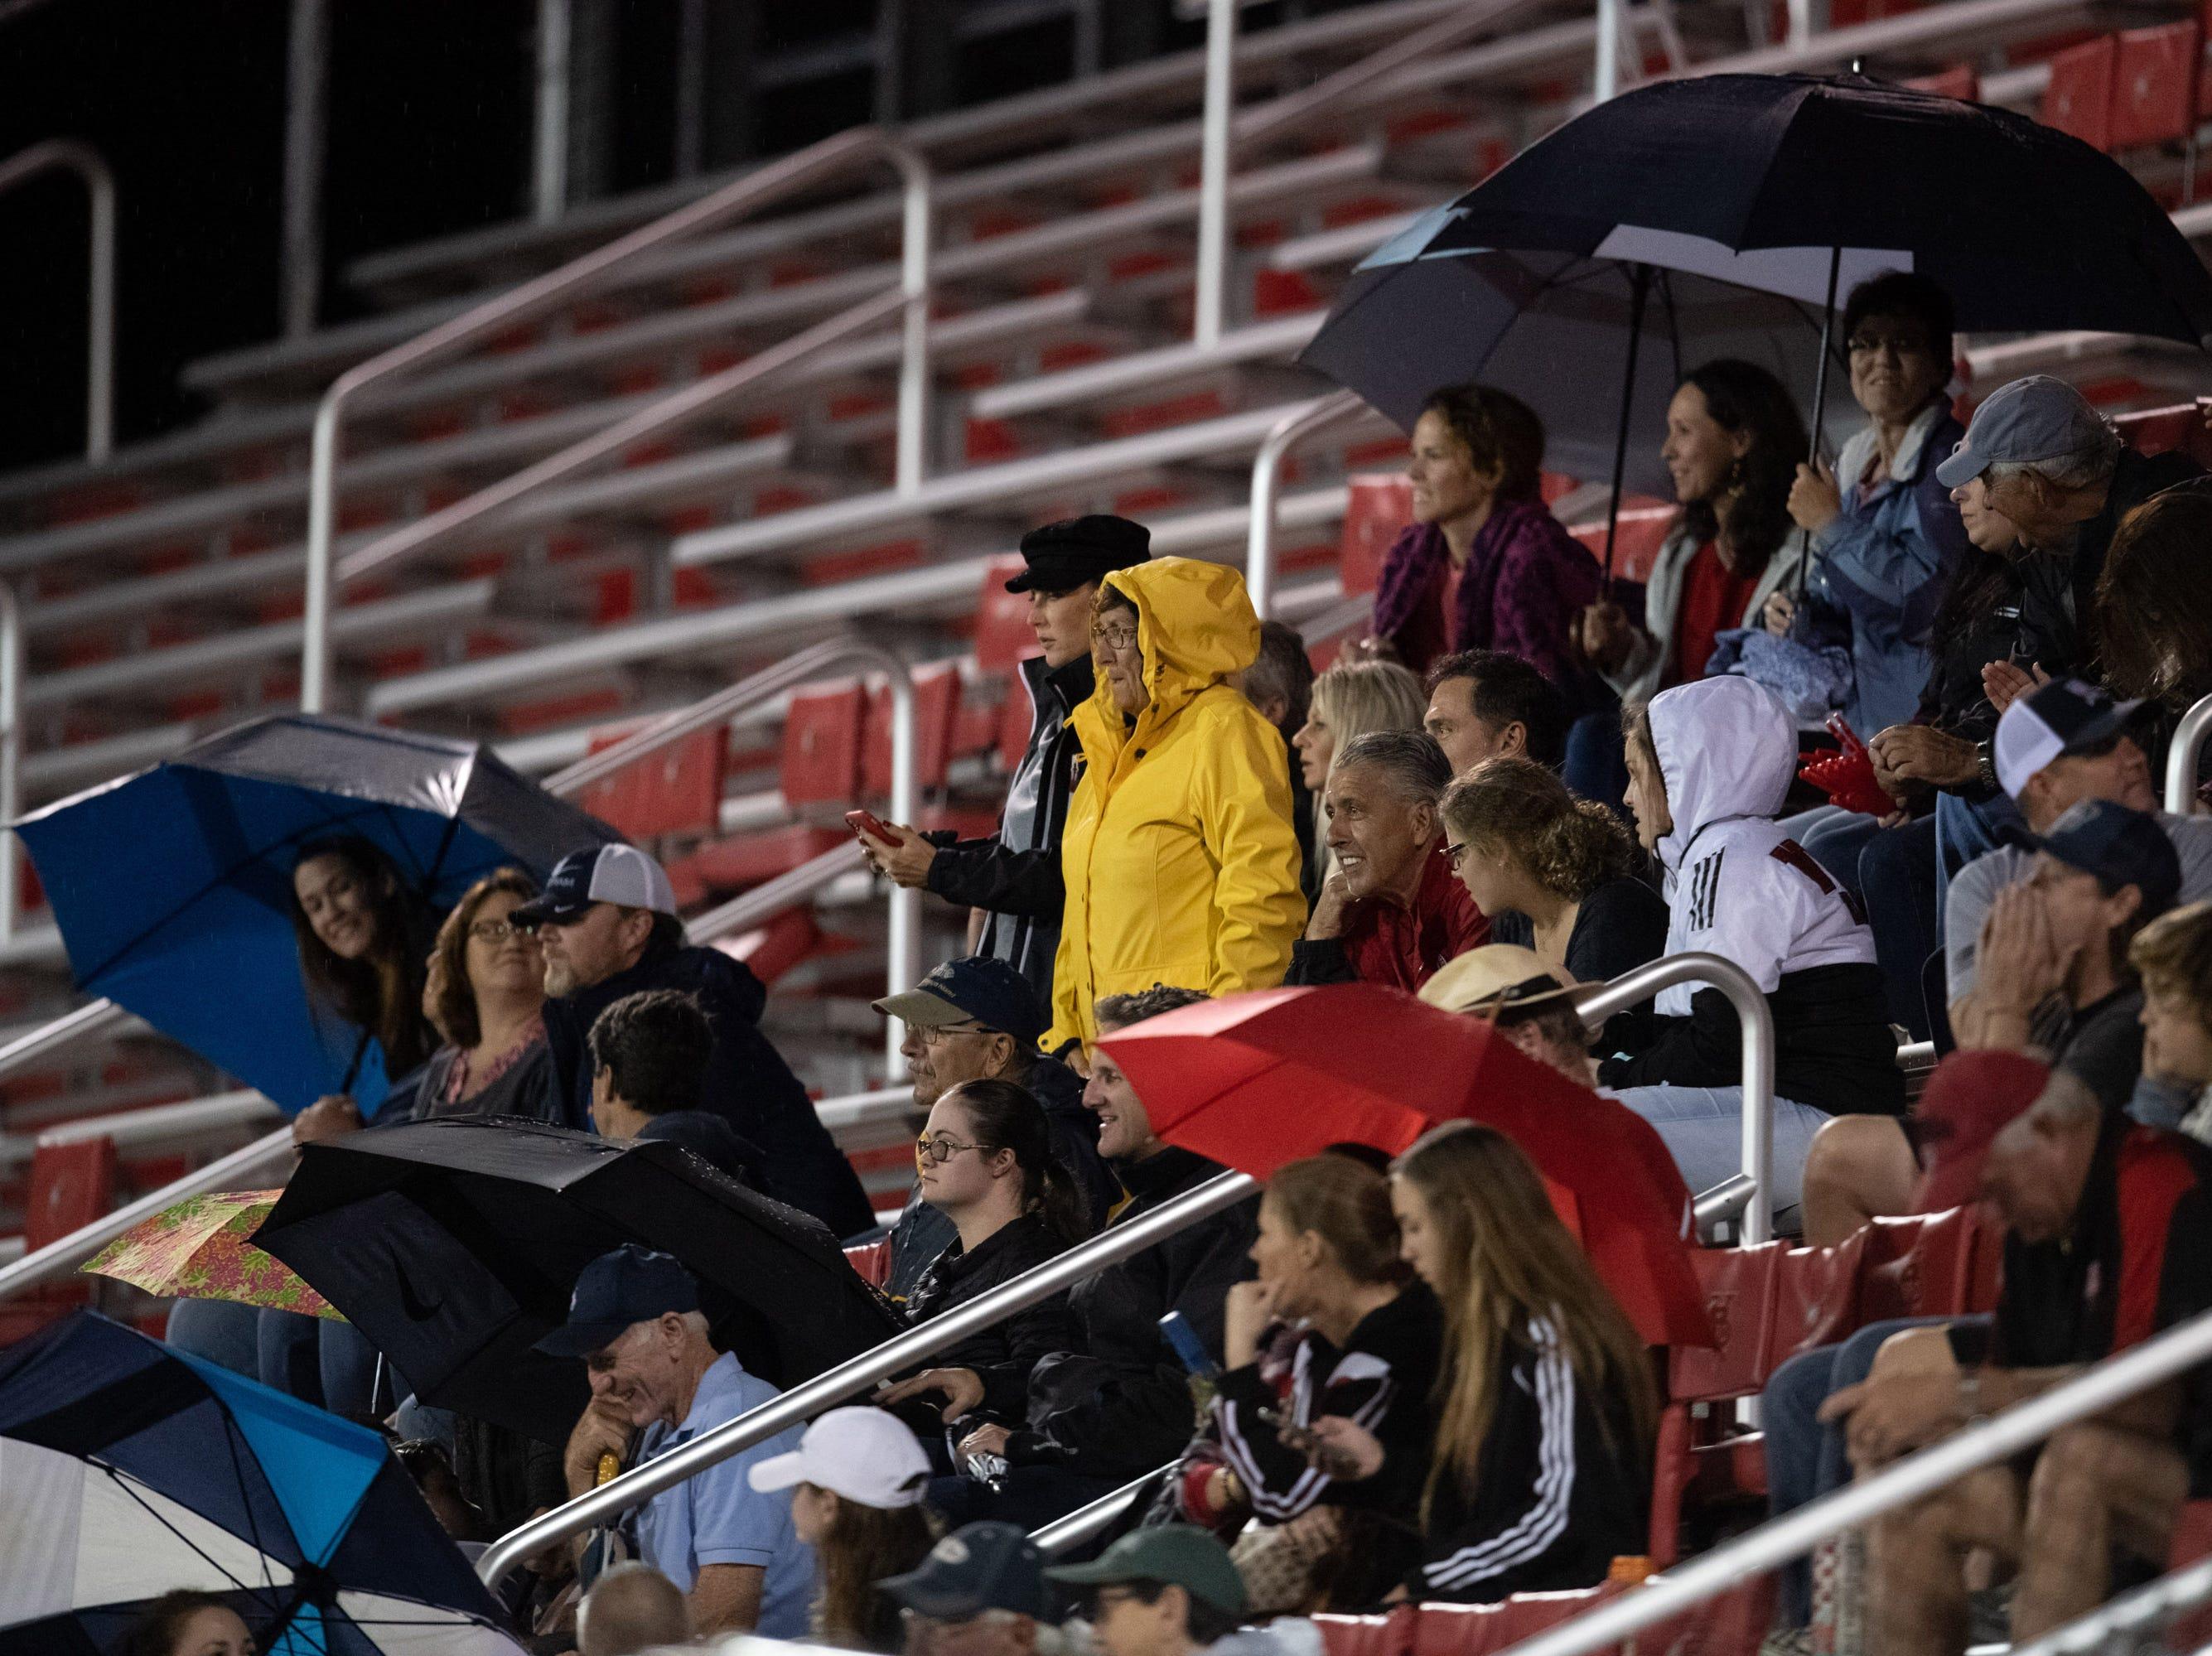 The Vero Beach High School girls soccer team hosts the regional championship game against Boca Raton on Tuesday, Feb. 12, 2019, at Vero Beach's Citrus Bowl.